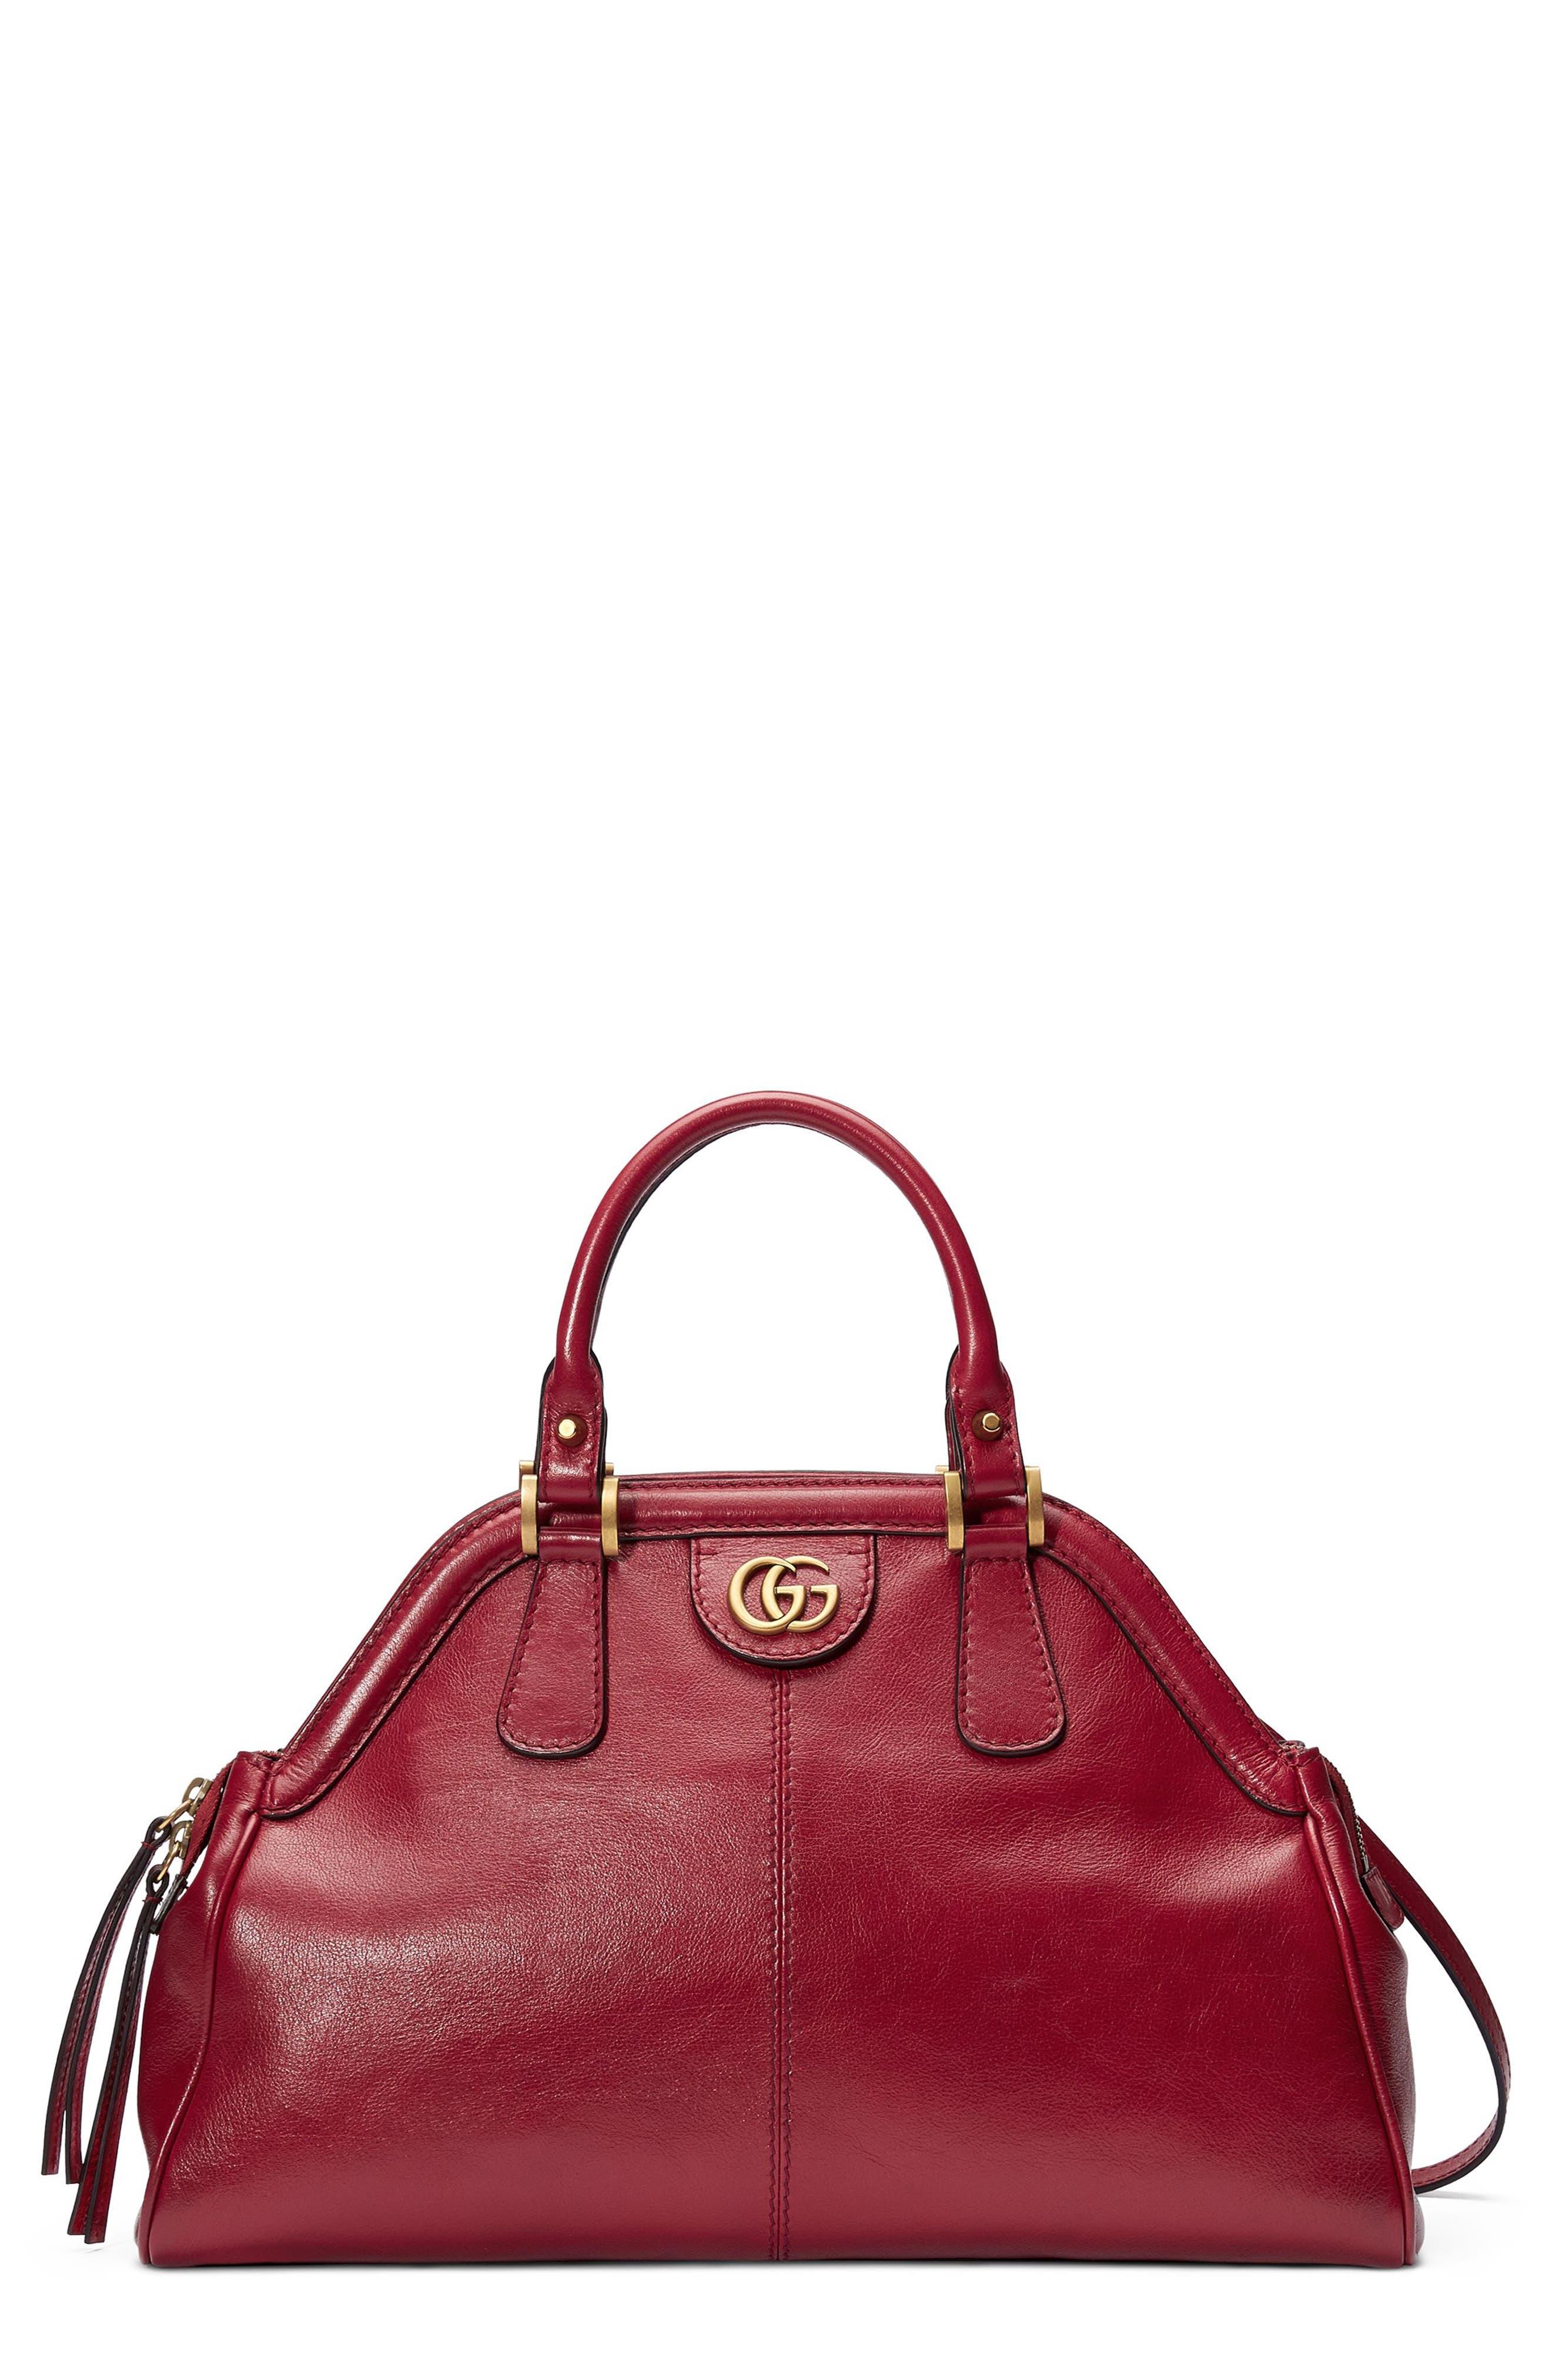 Gucci Medium RE(BELLE) Leather Satchel